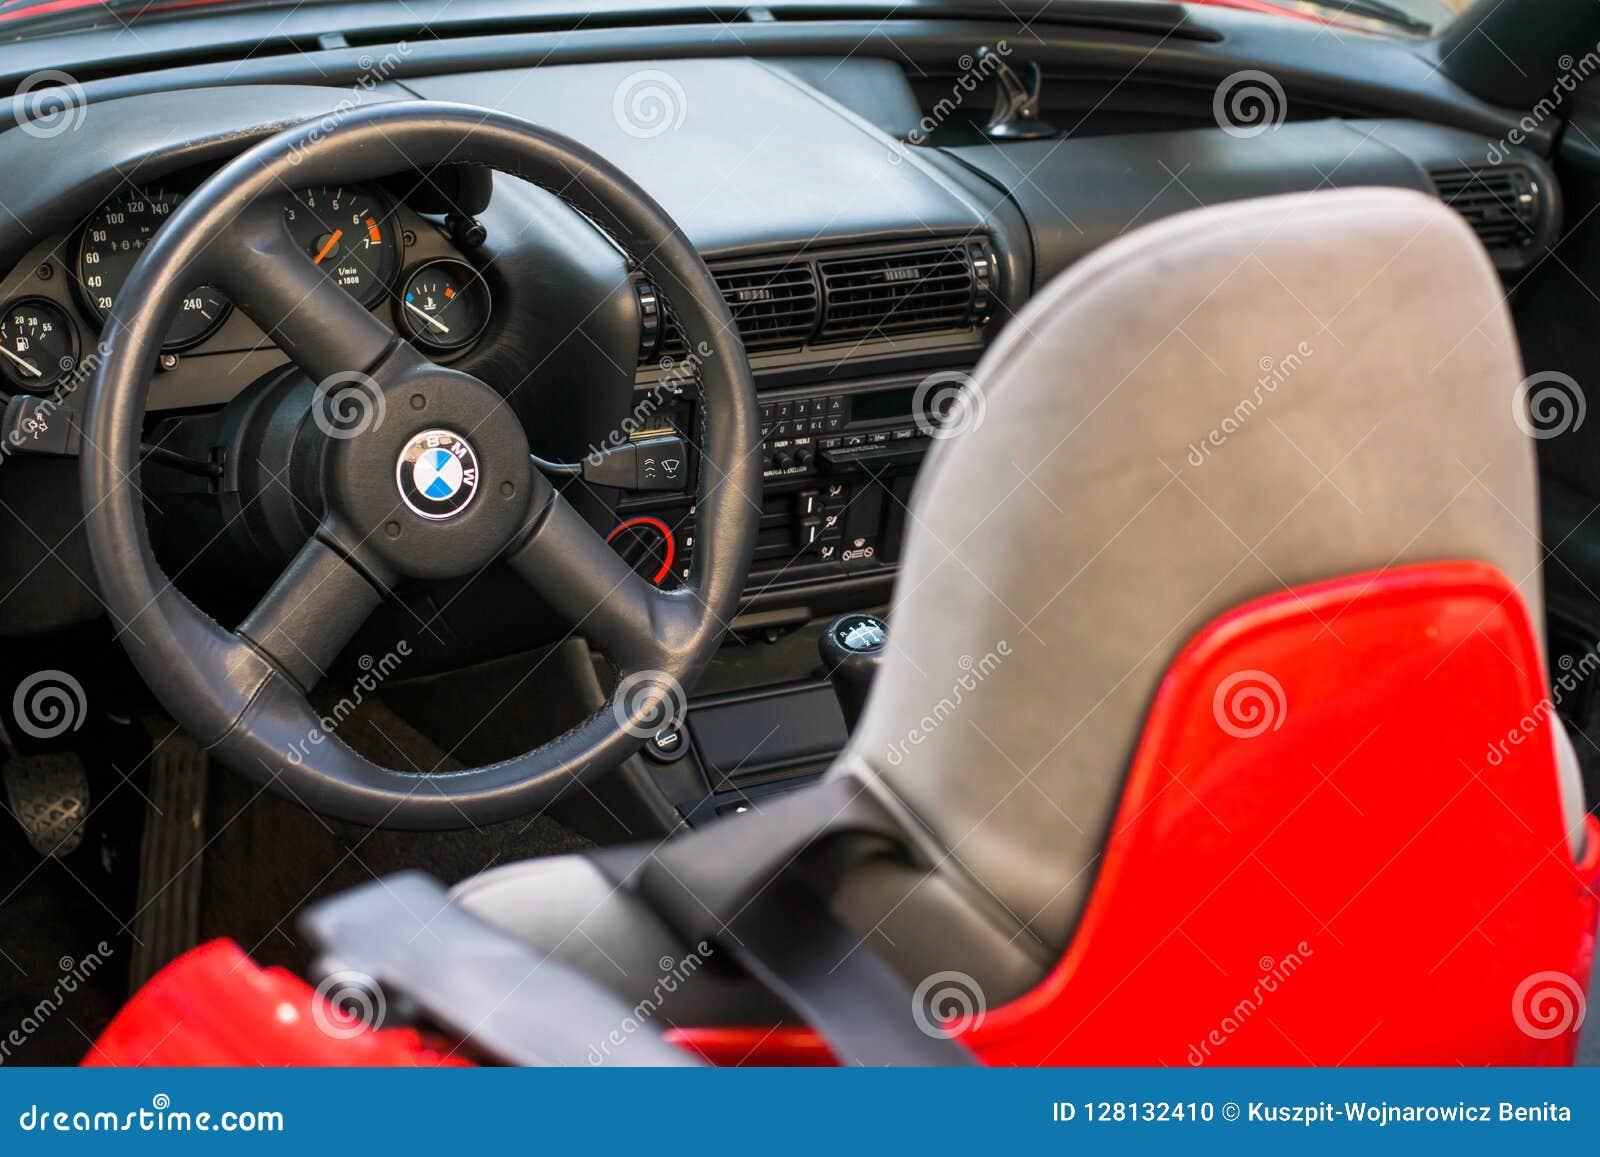 Bmw Sport Old Timer Car Editorial Image Image Of German 128132410